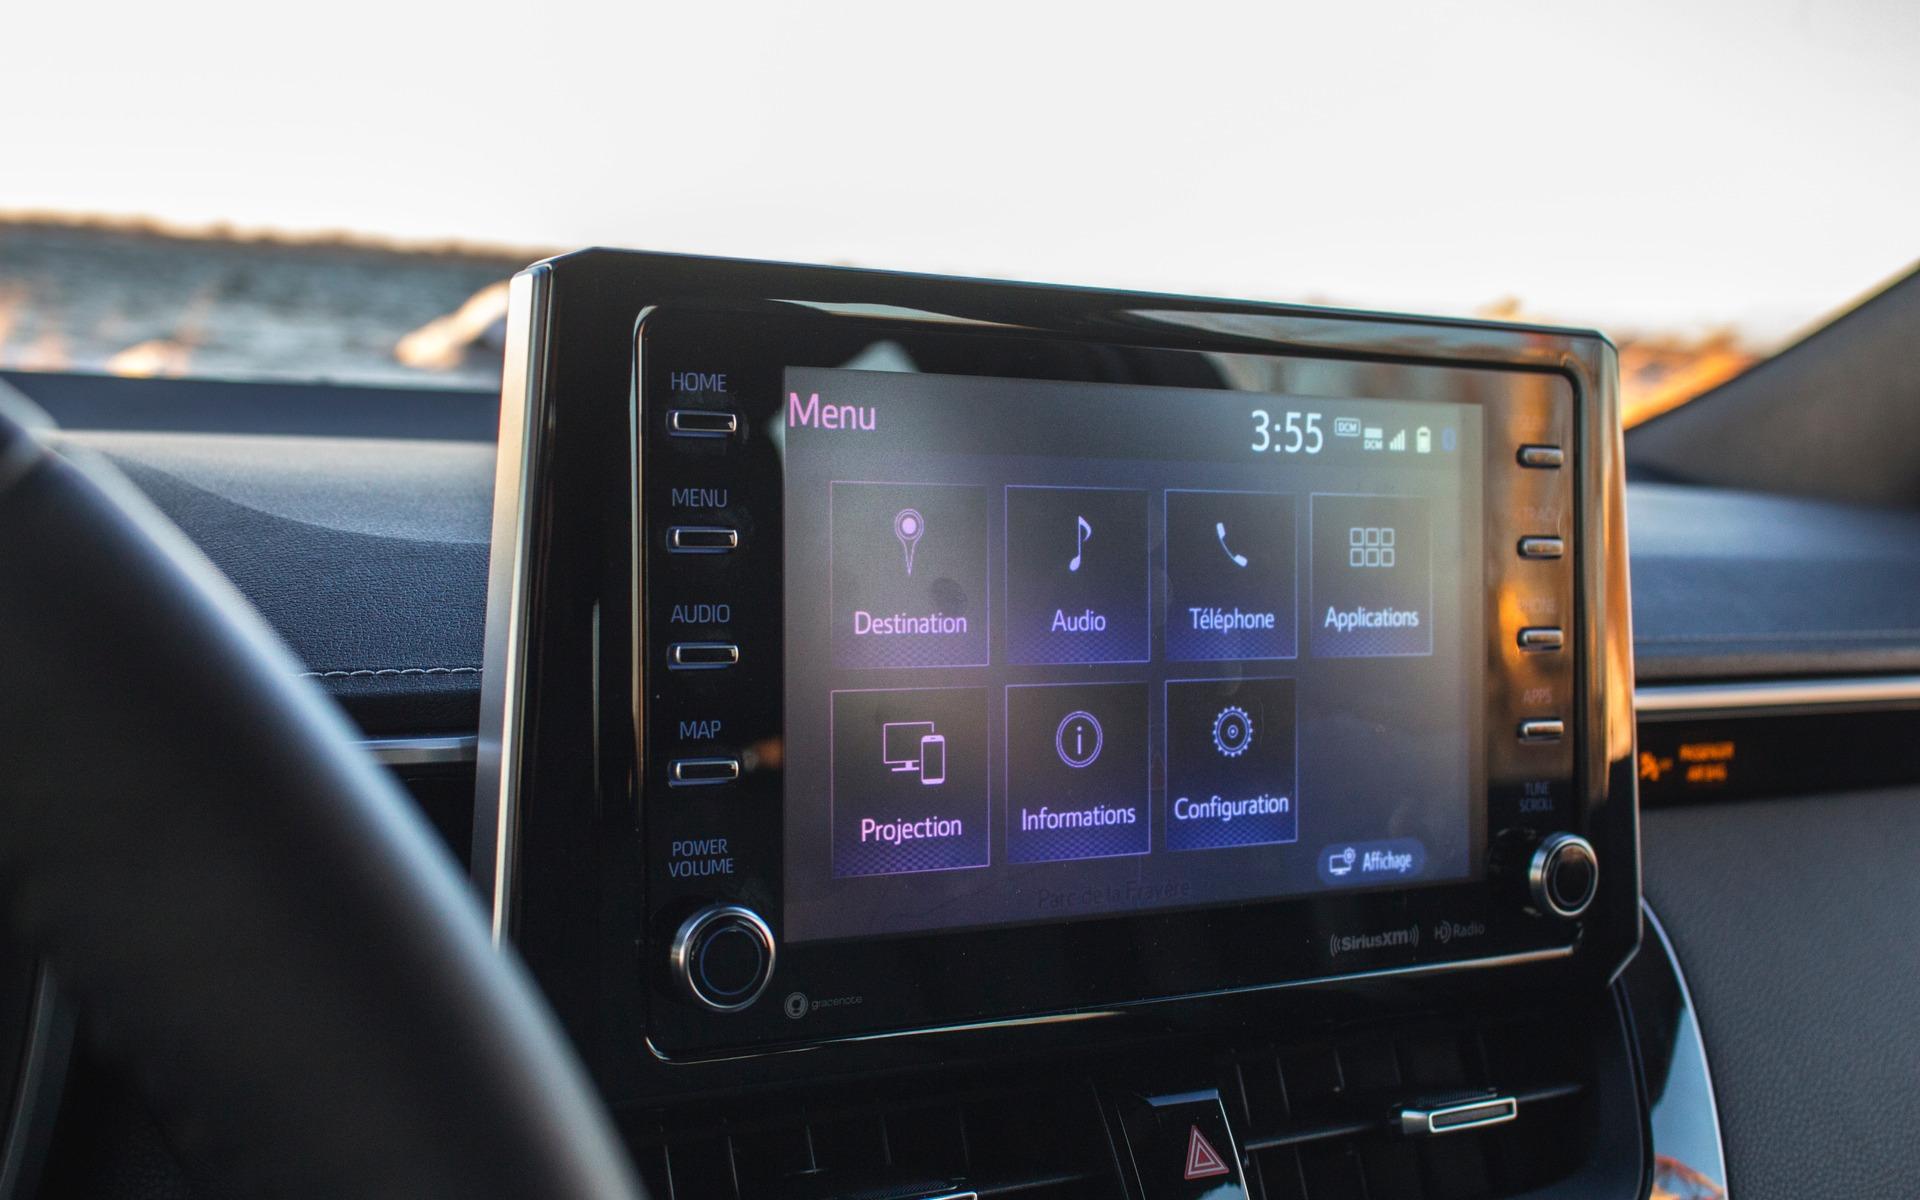 Toyota Corolla Hatchback 2019 : enfin, la Corolla que l'on a demandée! 357434_2019_Toyota_Corolla